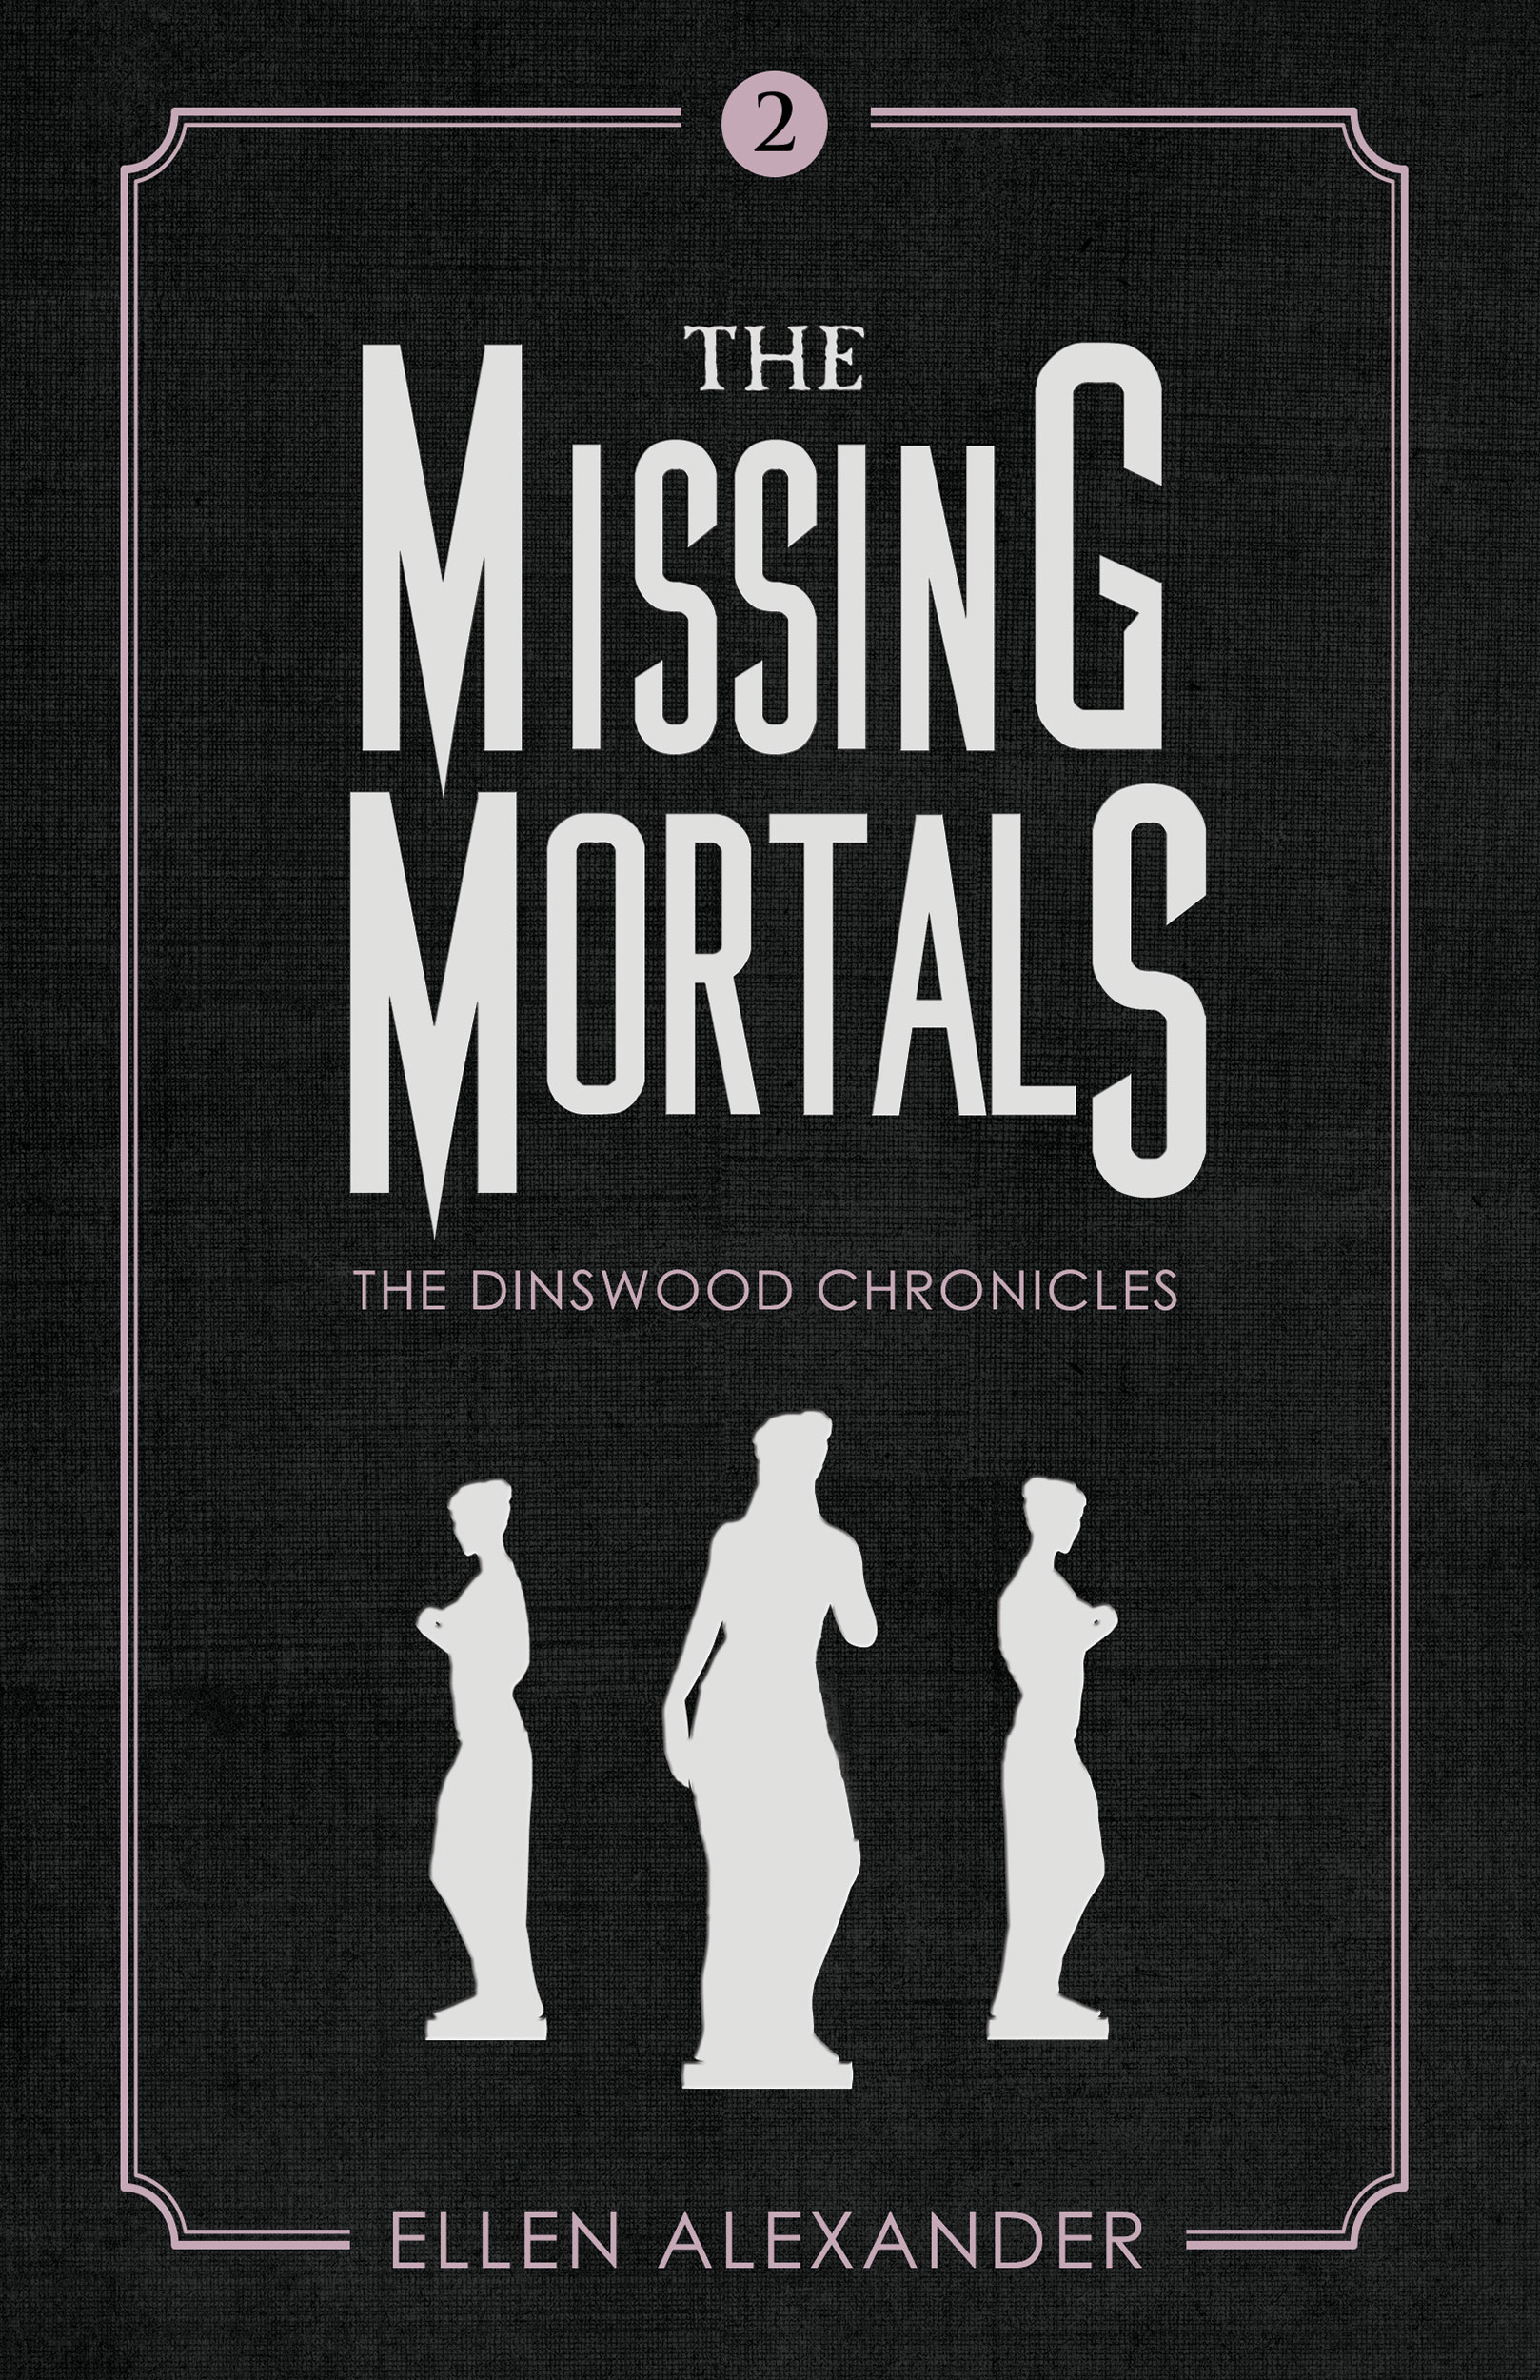 The Missing Mortals by Ellen Alexander